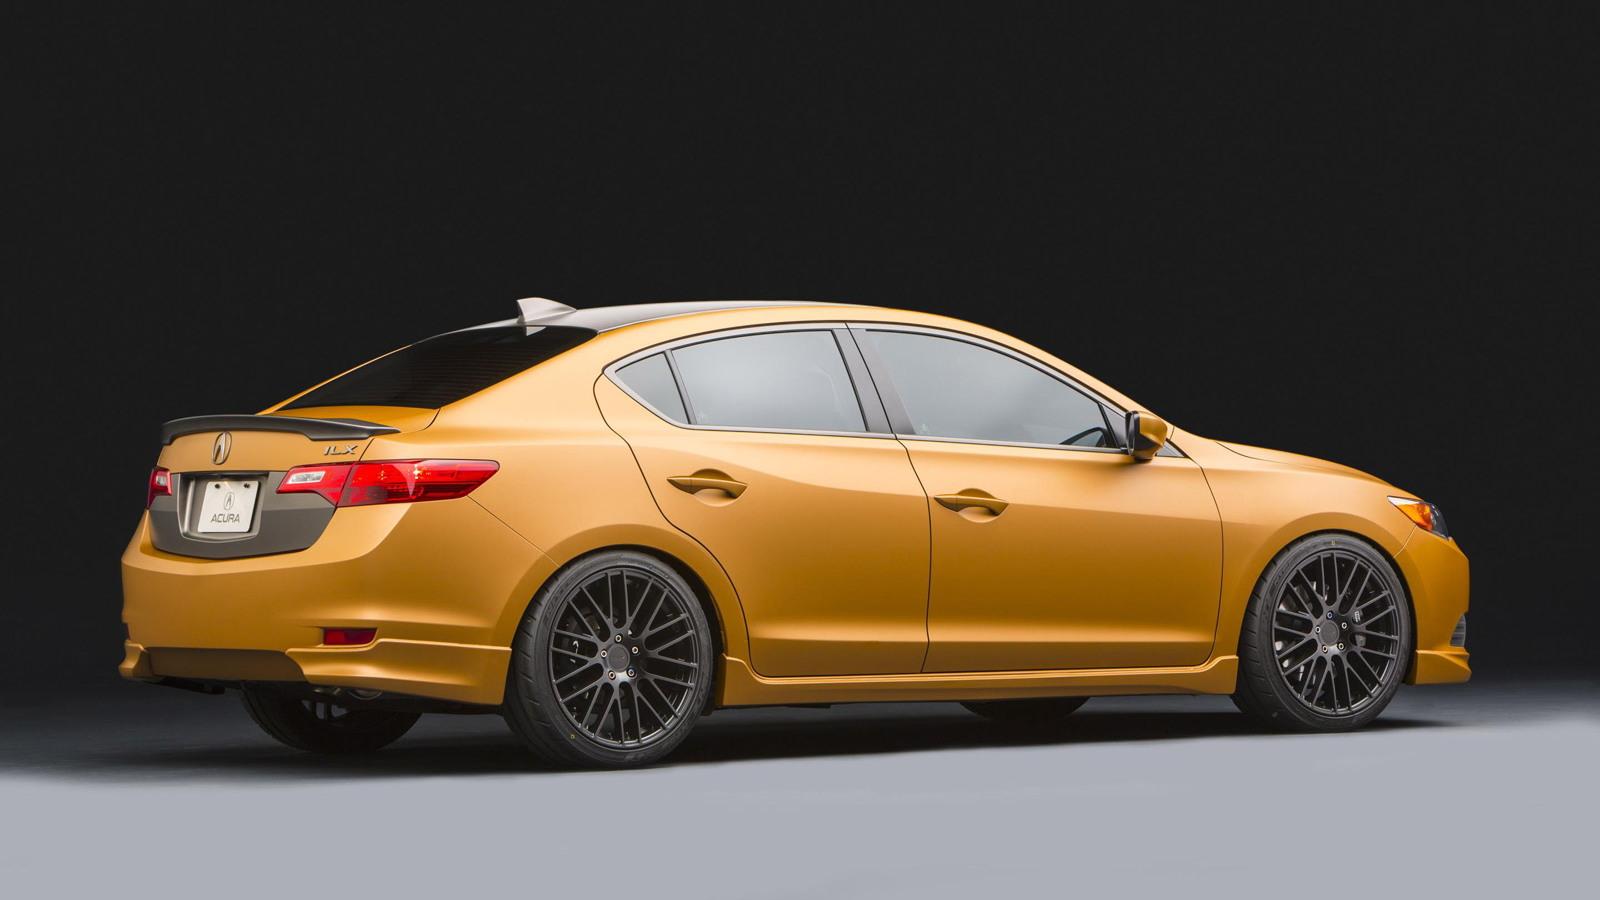 2014 Acura ILX Street Performance concept, 2013 SEMA